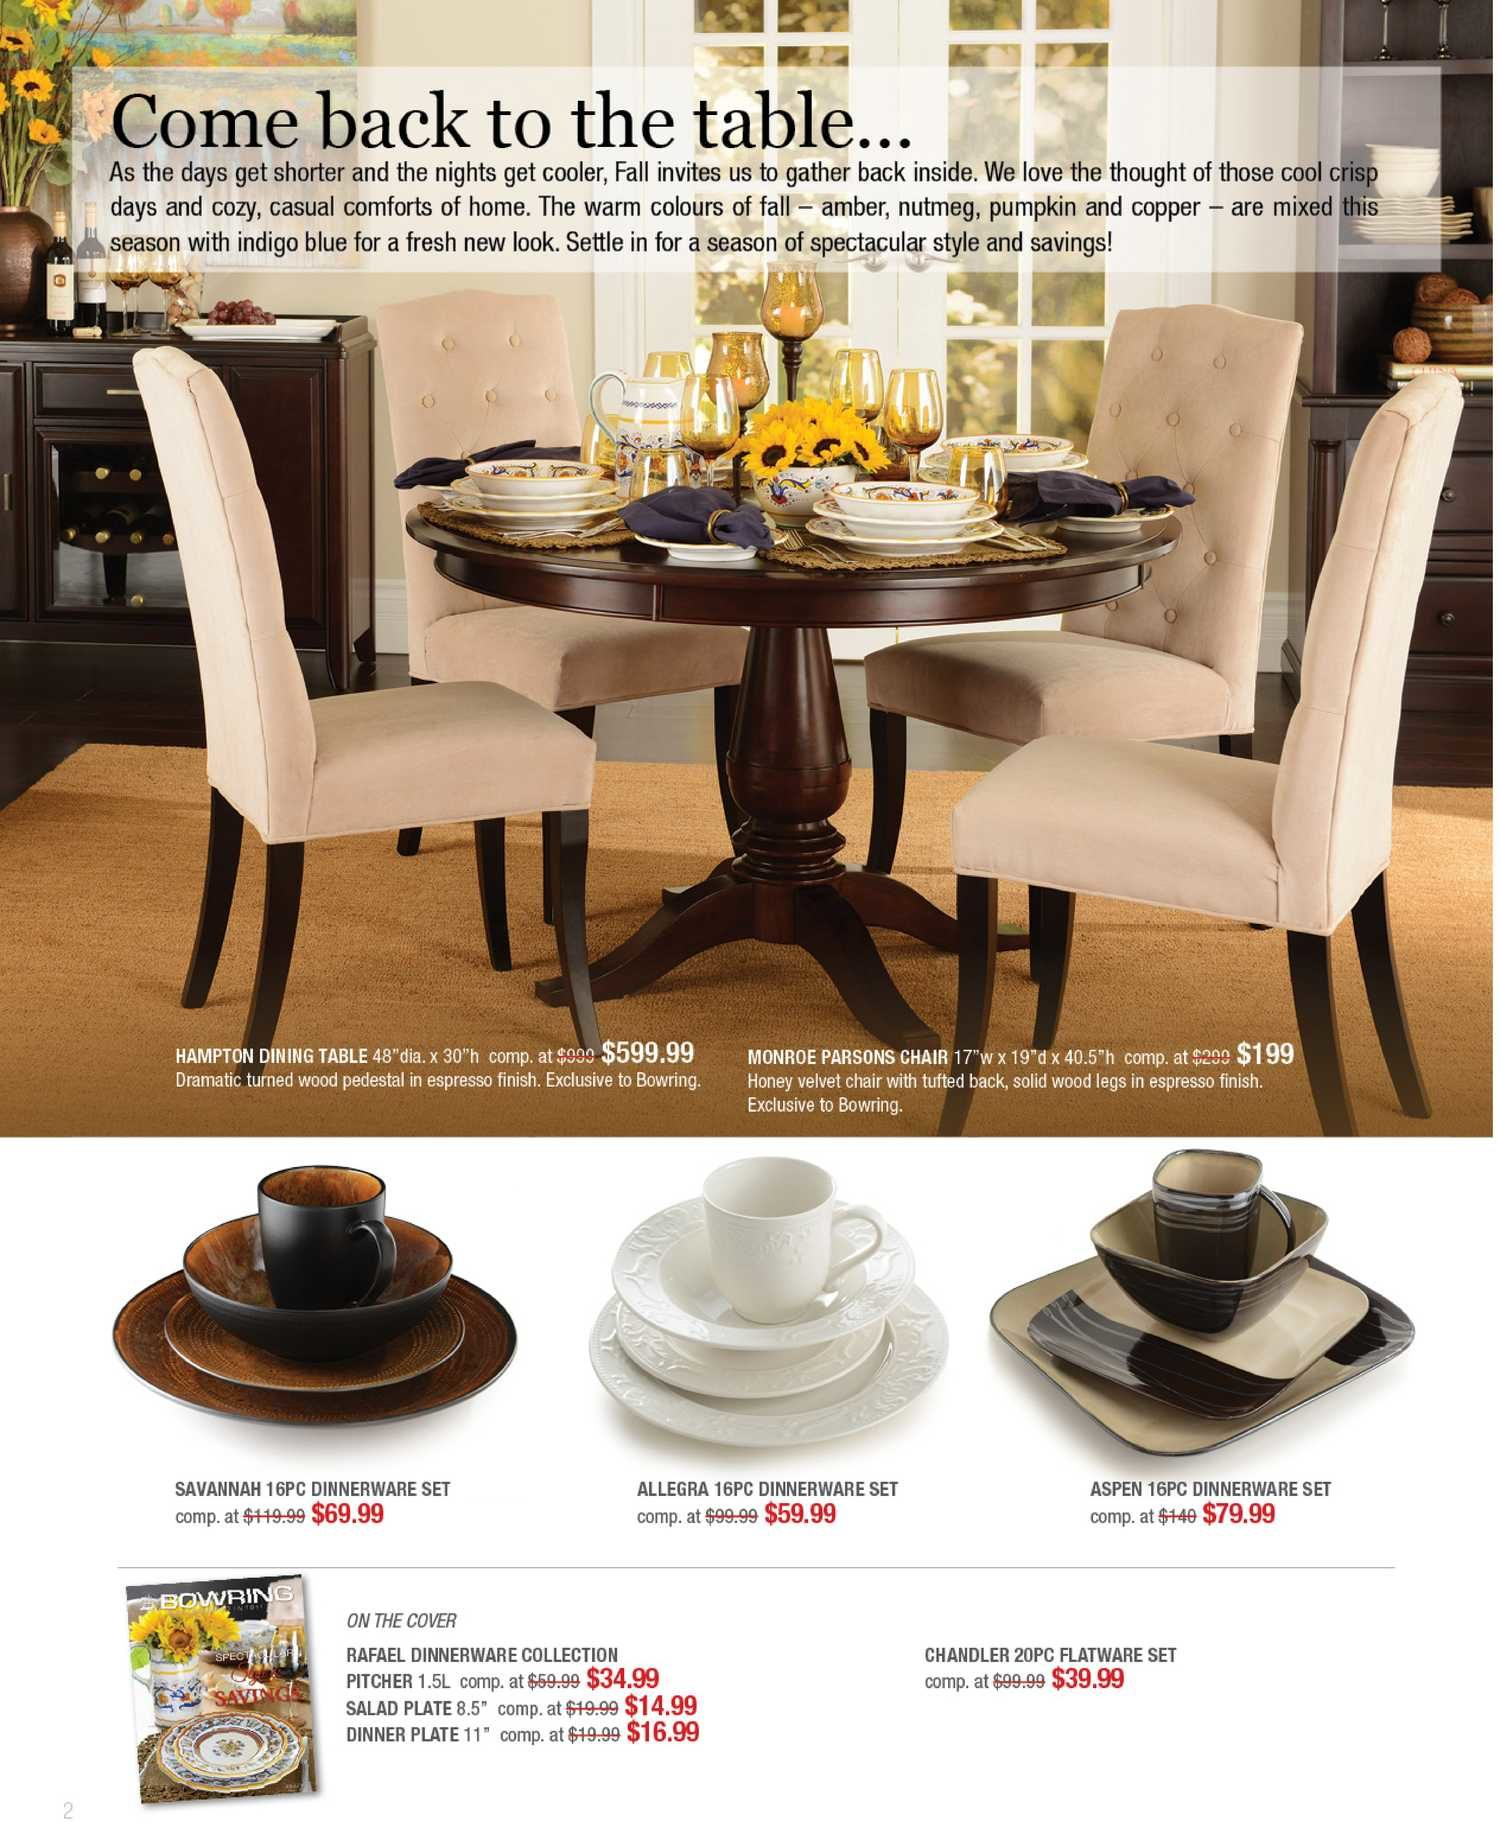 Bowring Weekly Flyer - Fall Catelogue 2013 - Style u0026 Savings - Oct 7 u2013 31 - RedFlagDeals.com & Bowring Weekly Flyer - Fall Catelogue 2013 - Style u0026 Savings - Oct 7 ...